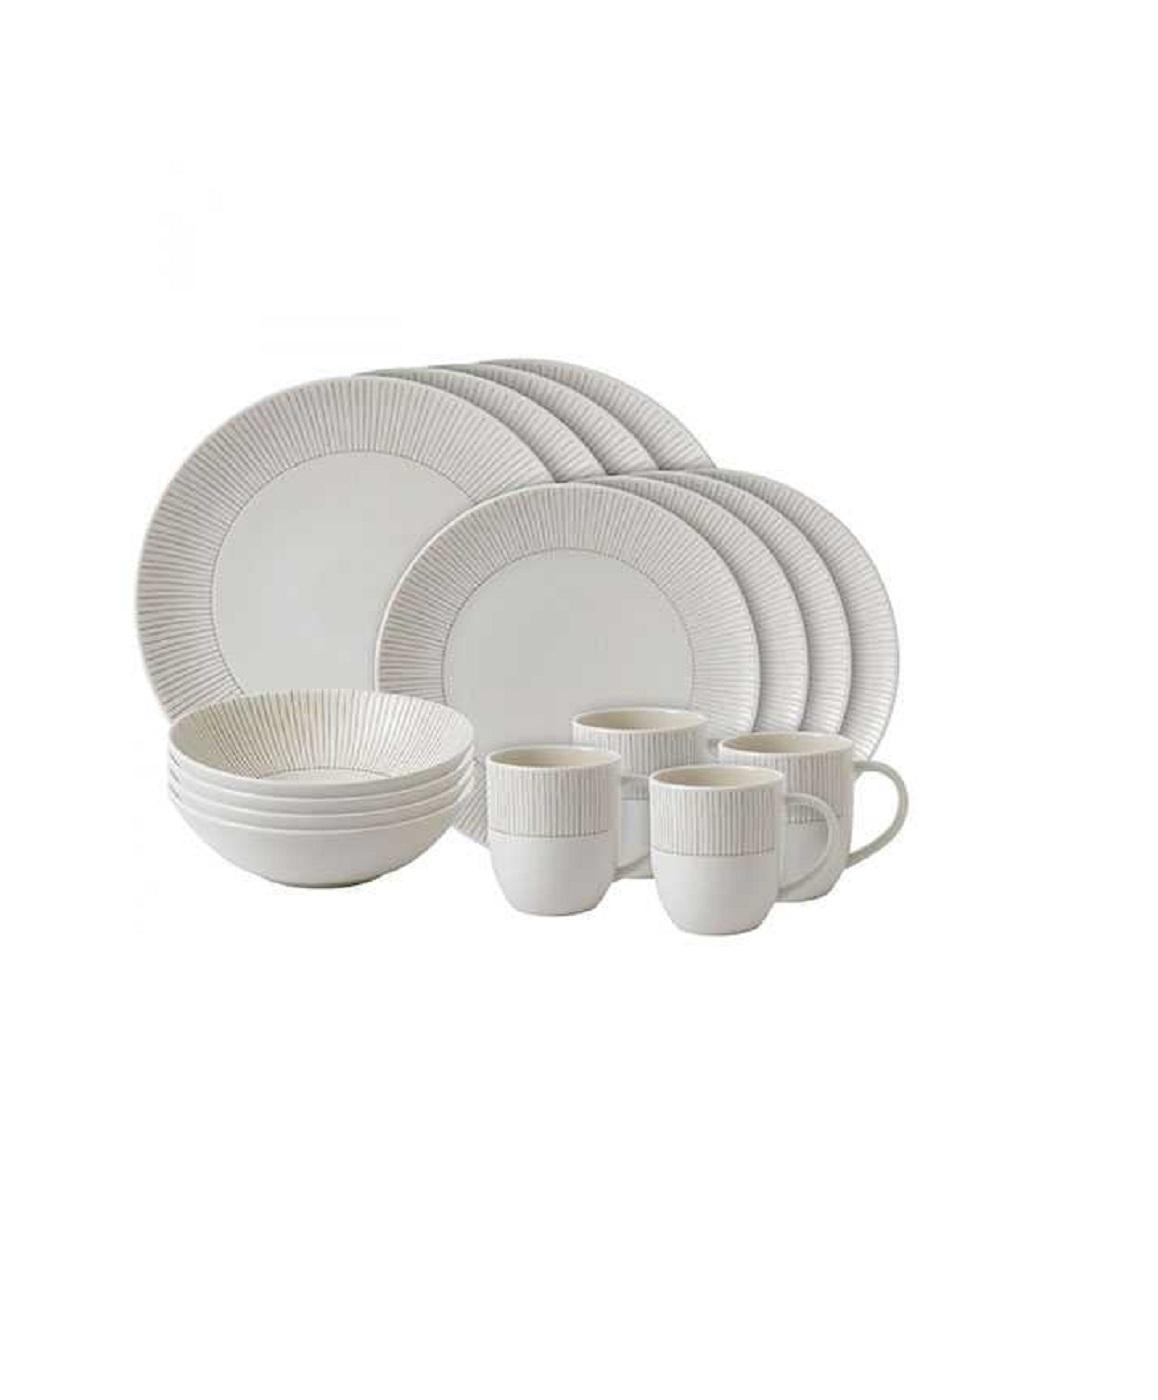 Онлайн каталог PROMENU: Набор столовой посуды Royal Doulton ED TABLEWARE, бежевый, 16 предметов                               40027621